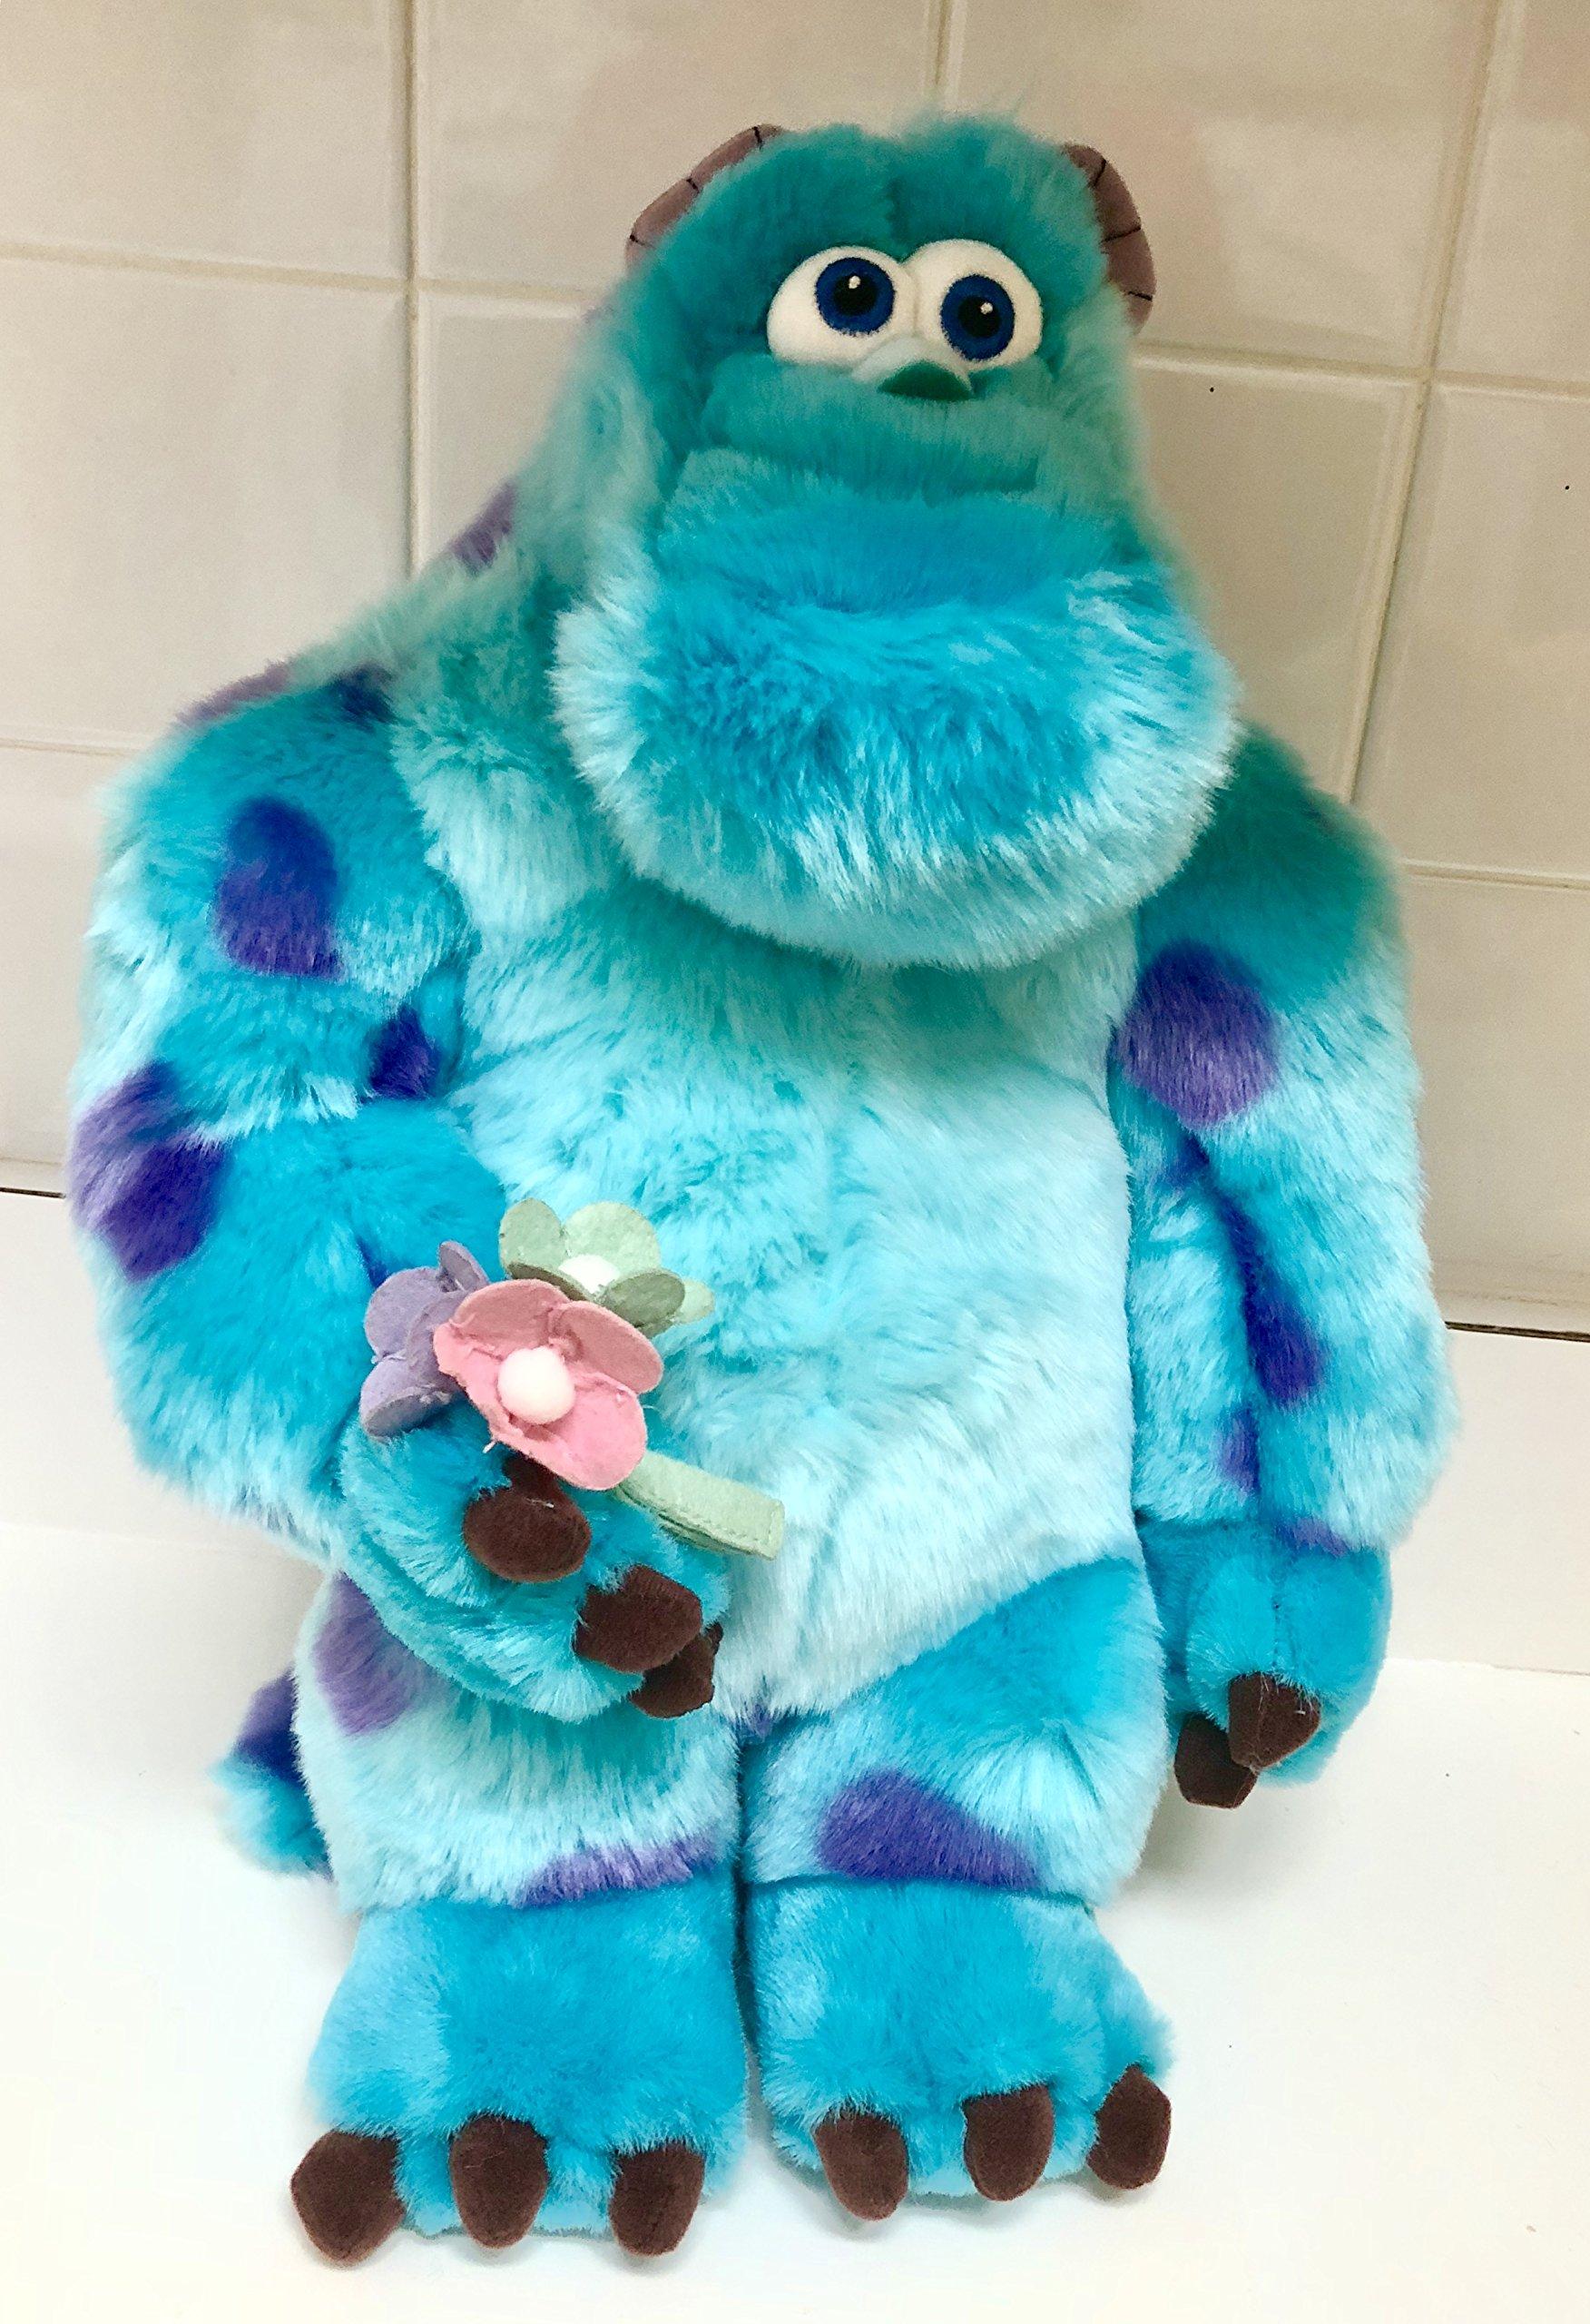 Disney Monster Inc University Sullivan Sully Sulley 16'' Plush Soft Holding Flowers Easter Spring Valentine's Stuffed Toy